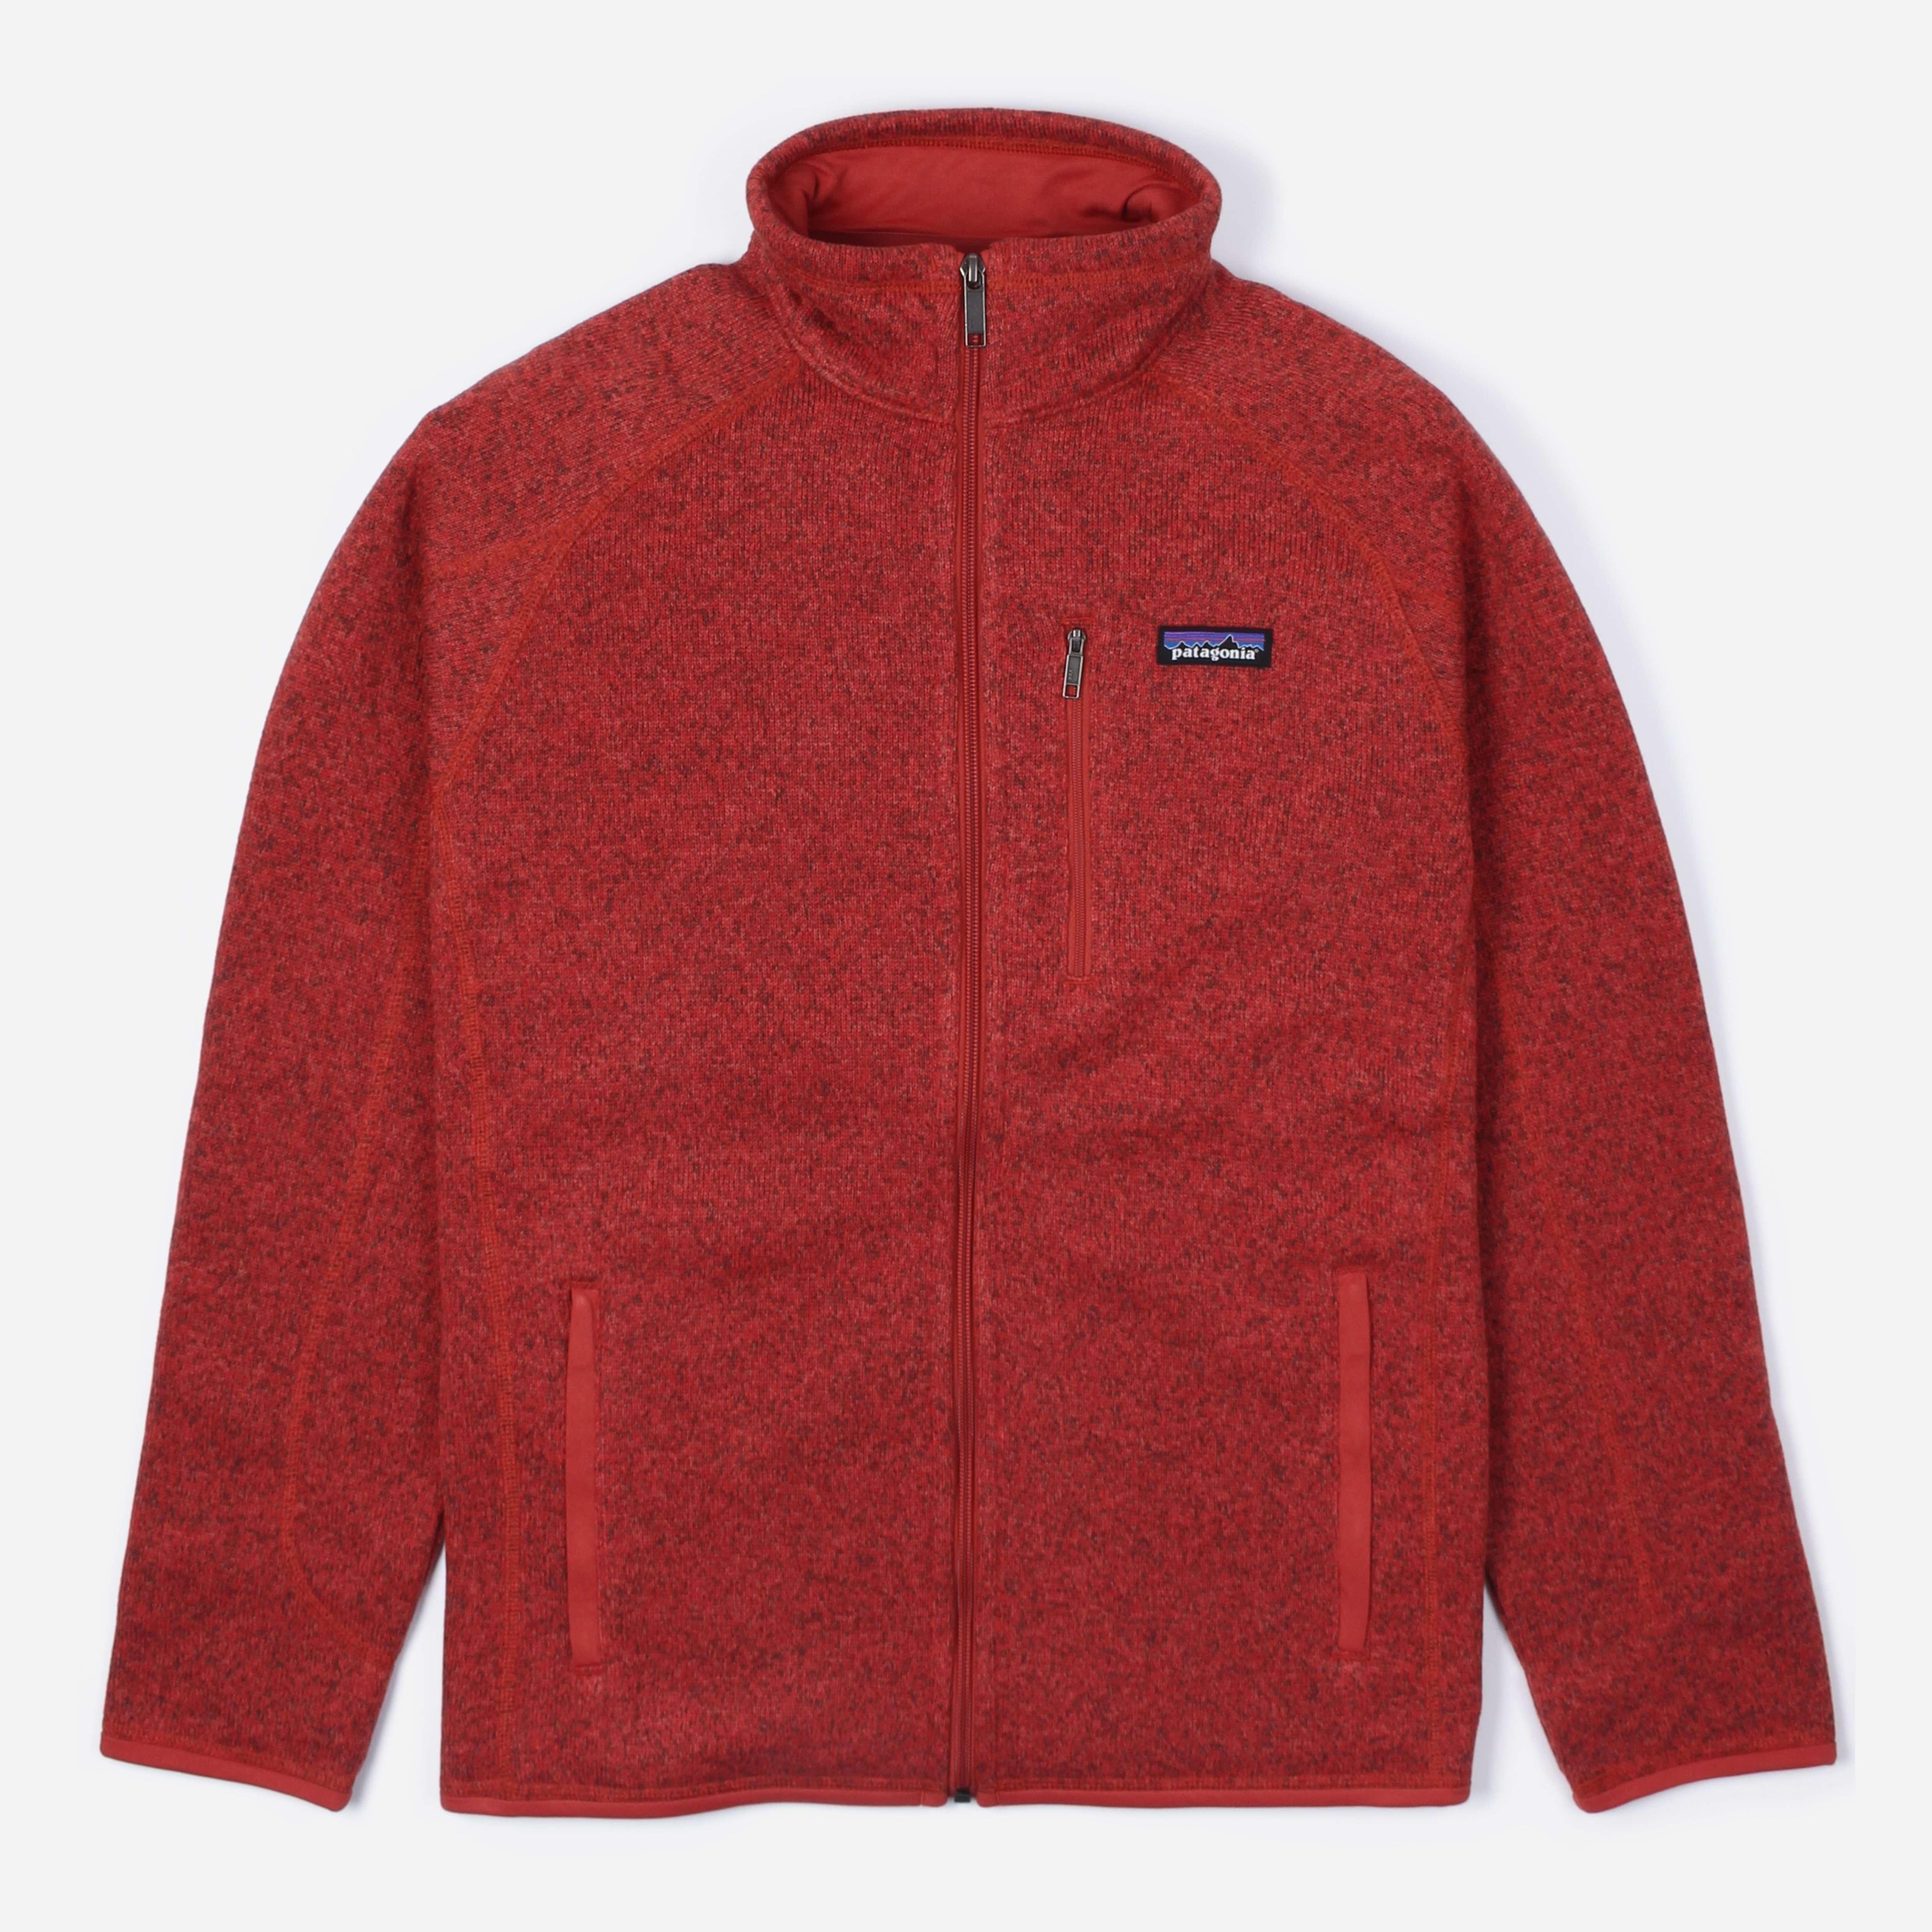 Patagonia Better Sweater Fleece Jacket